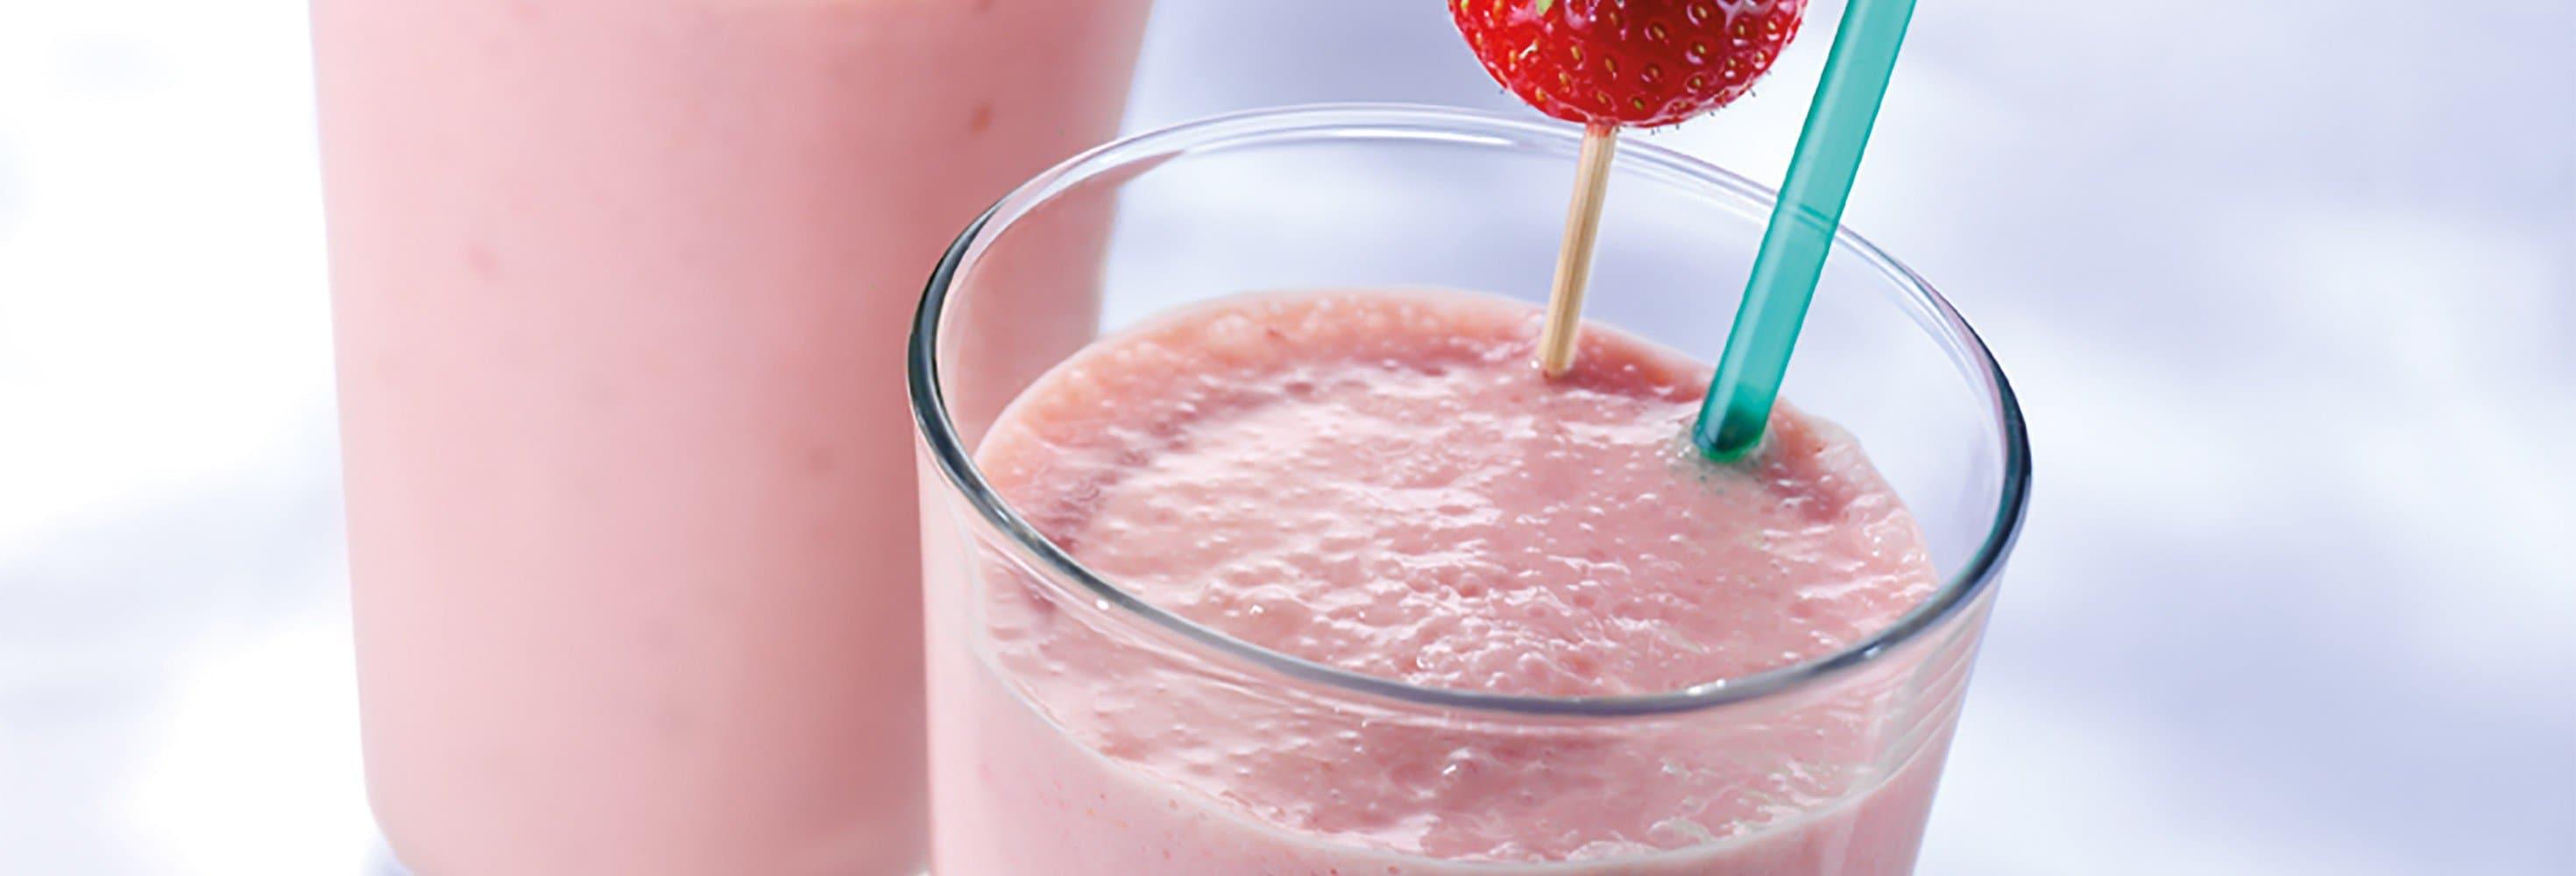 Milkshake met zomerfruit